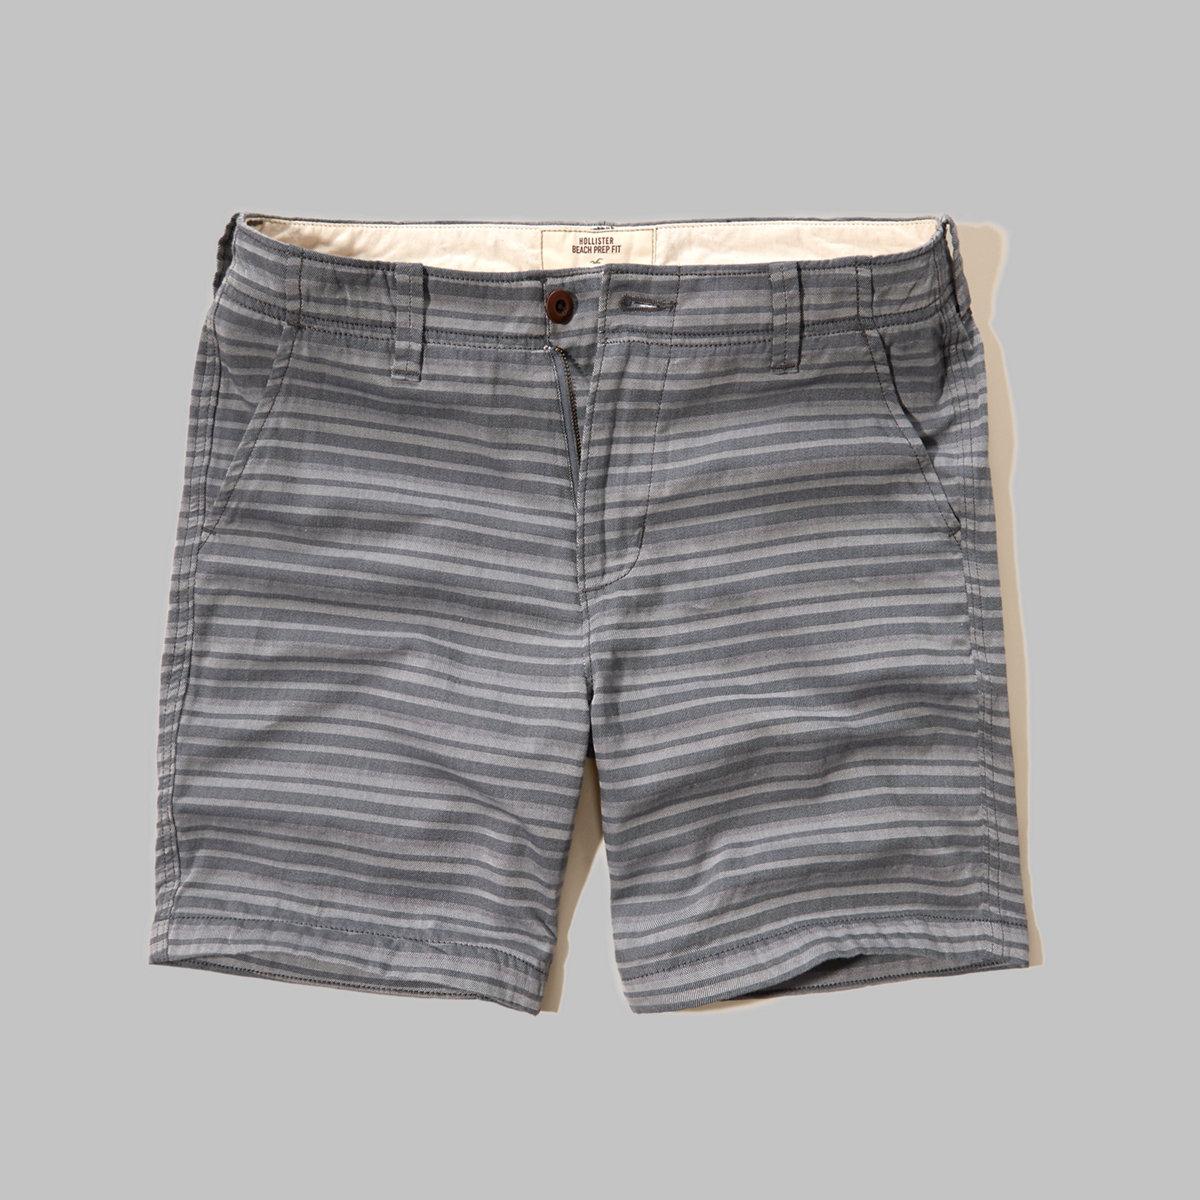 Hollister Beach Prep Fit Shorts